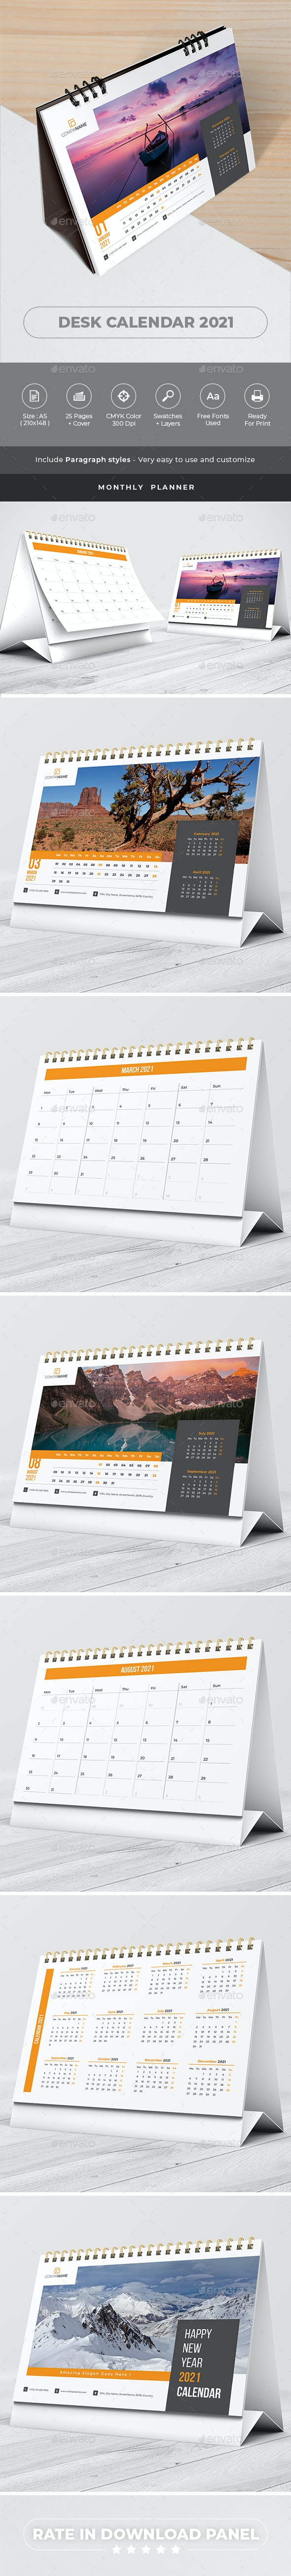 Desk Calendar 2021 Planner - Calendars Stationery